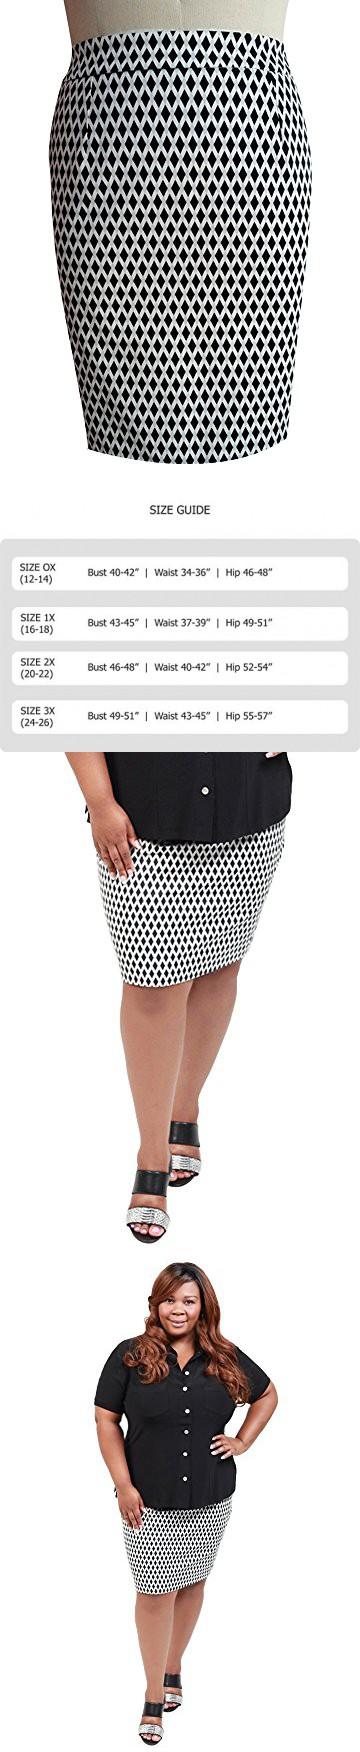 09697ba996d TD New York Curvy Women s Plus Size CHRISSA Cotton Pencil Skirt in Black  White Geometric Print